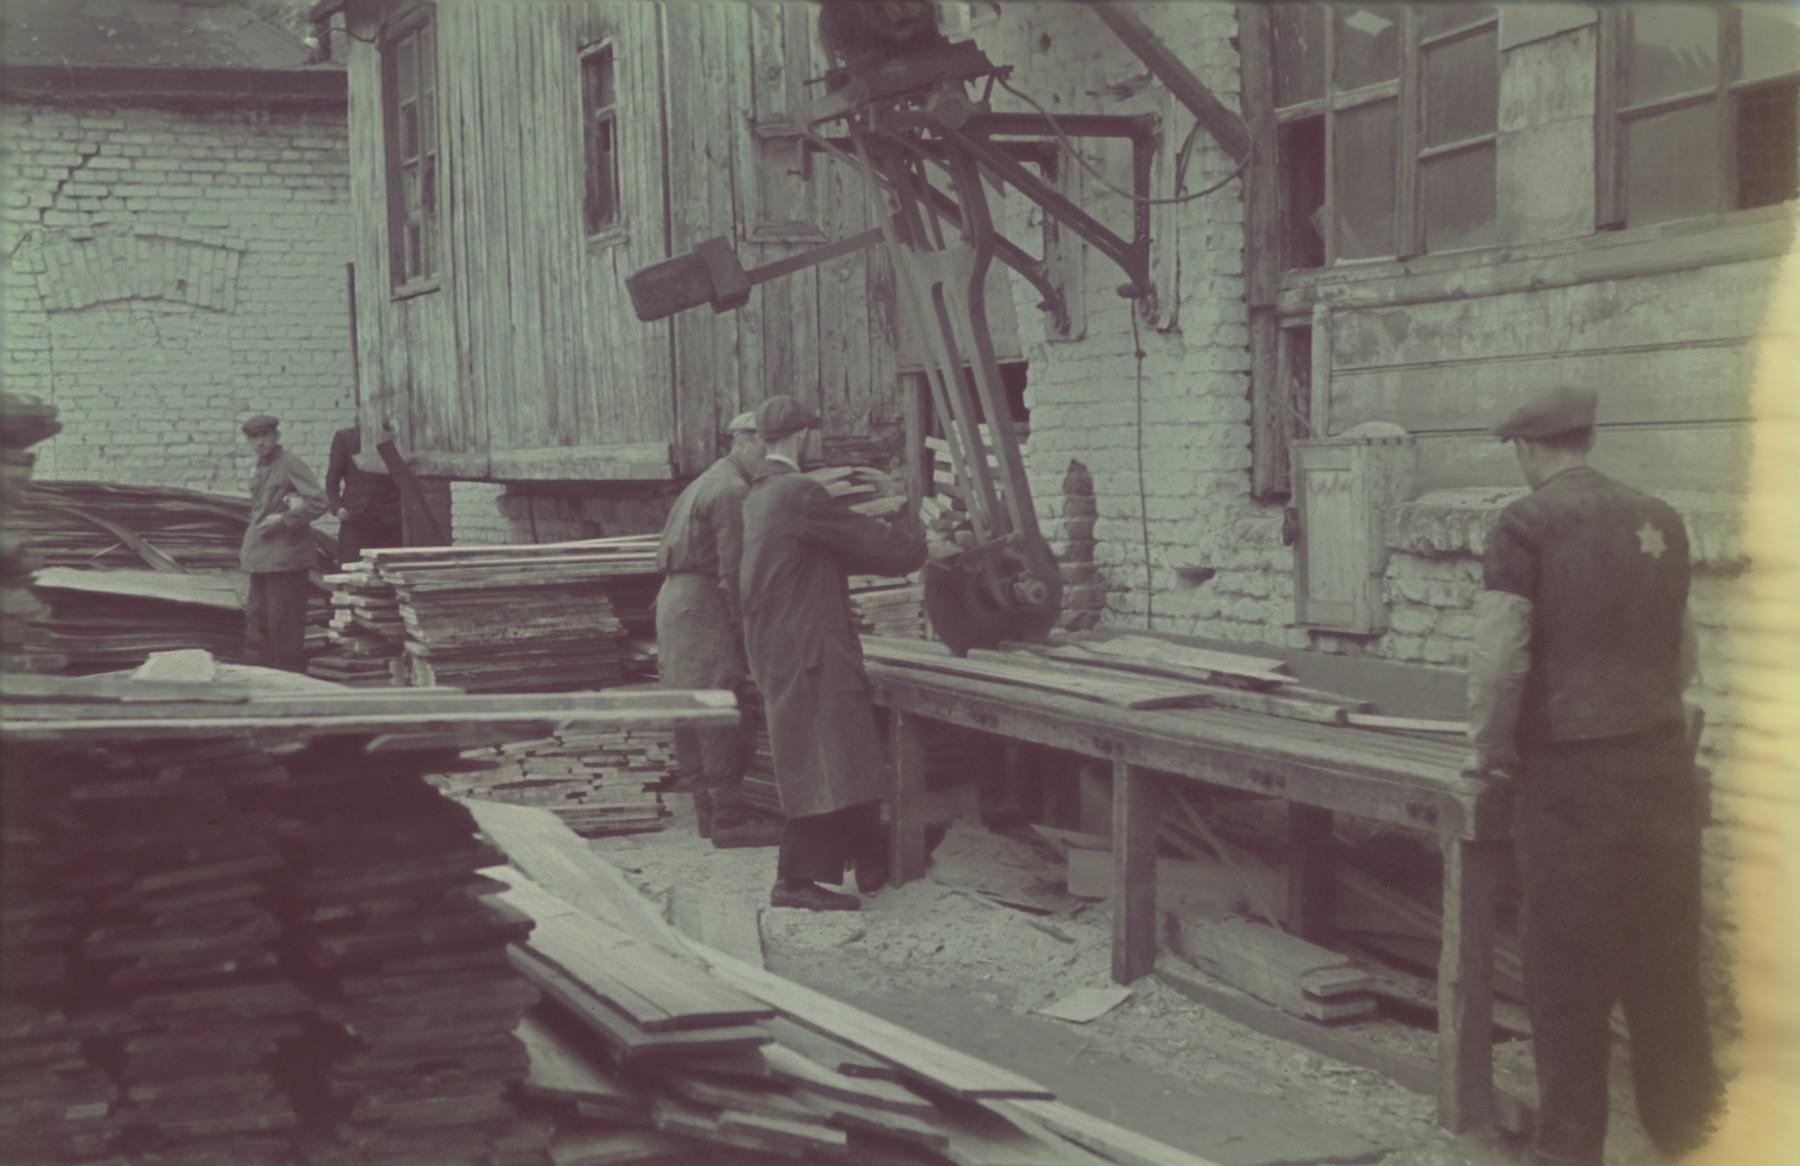 "Carpenters work in the Lodz ghetto furniture factory.  Original German caption: ""Litzmannstadt ghetto, Moebelfabrik"" (furniture factory)."